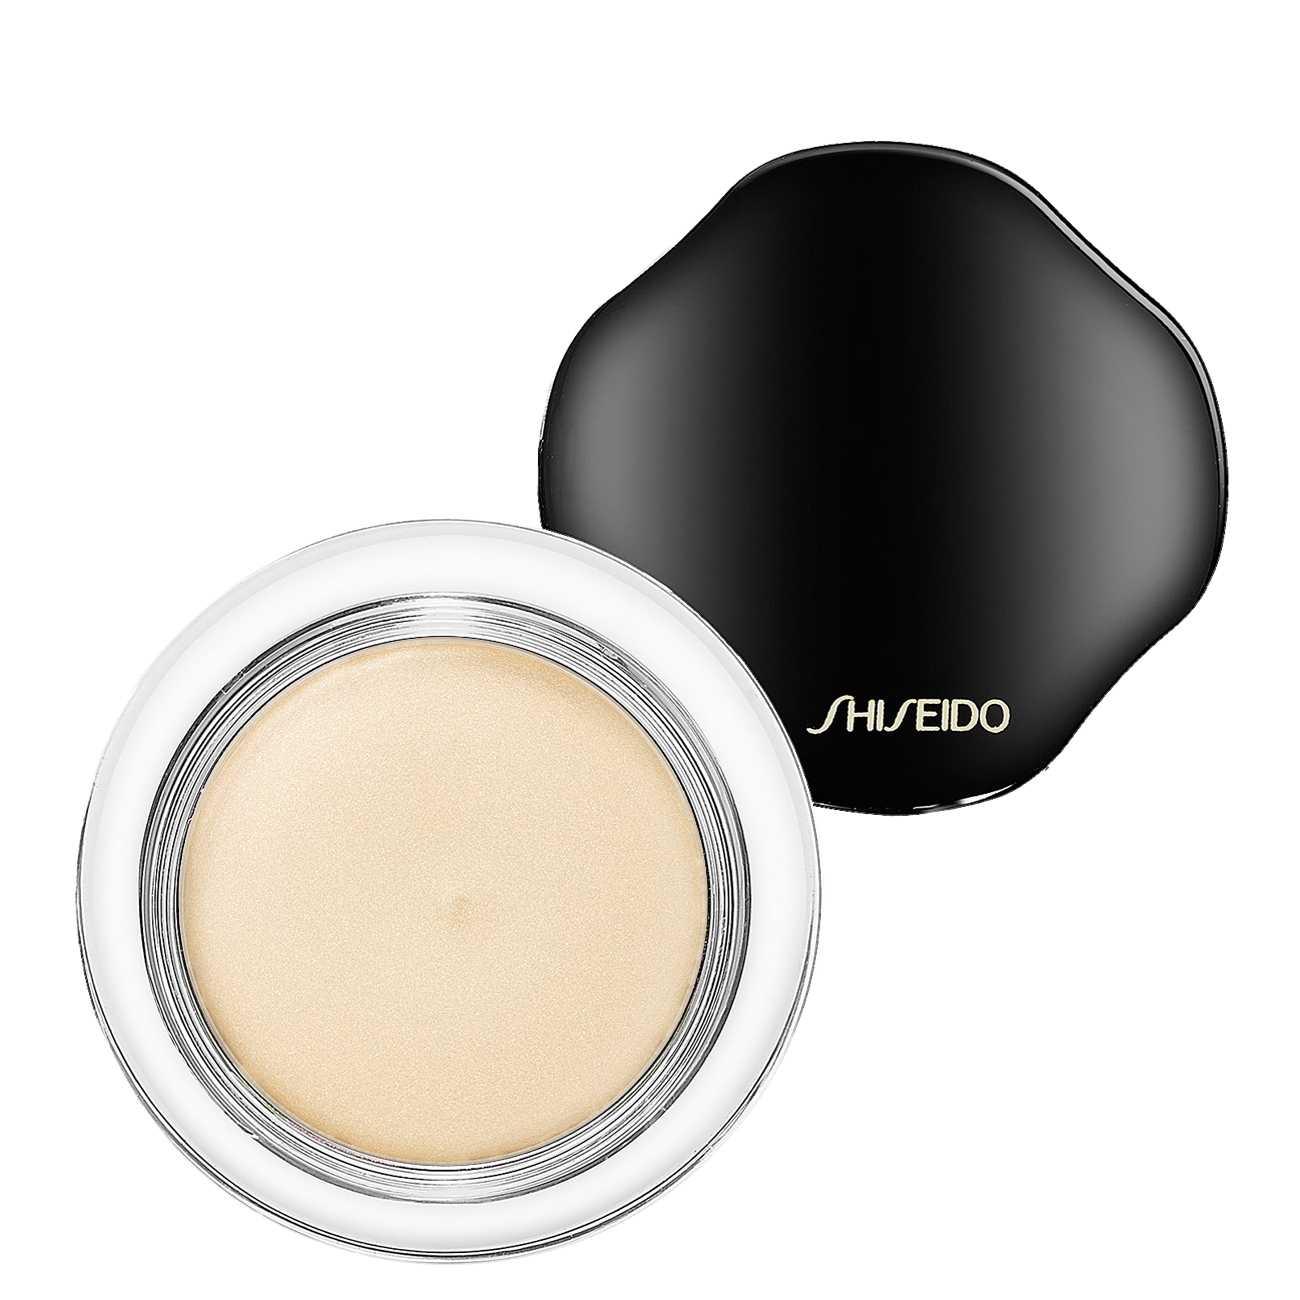 Shimmering Cream Eye Color 6 G Yuba Creamy Beige Be 217 Shiseido imagine 2021 bestvalue.eu